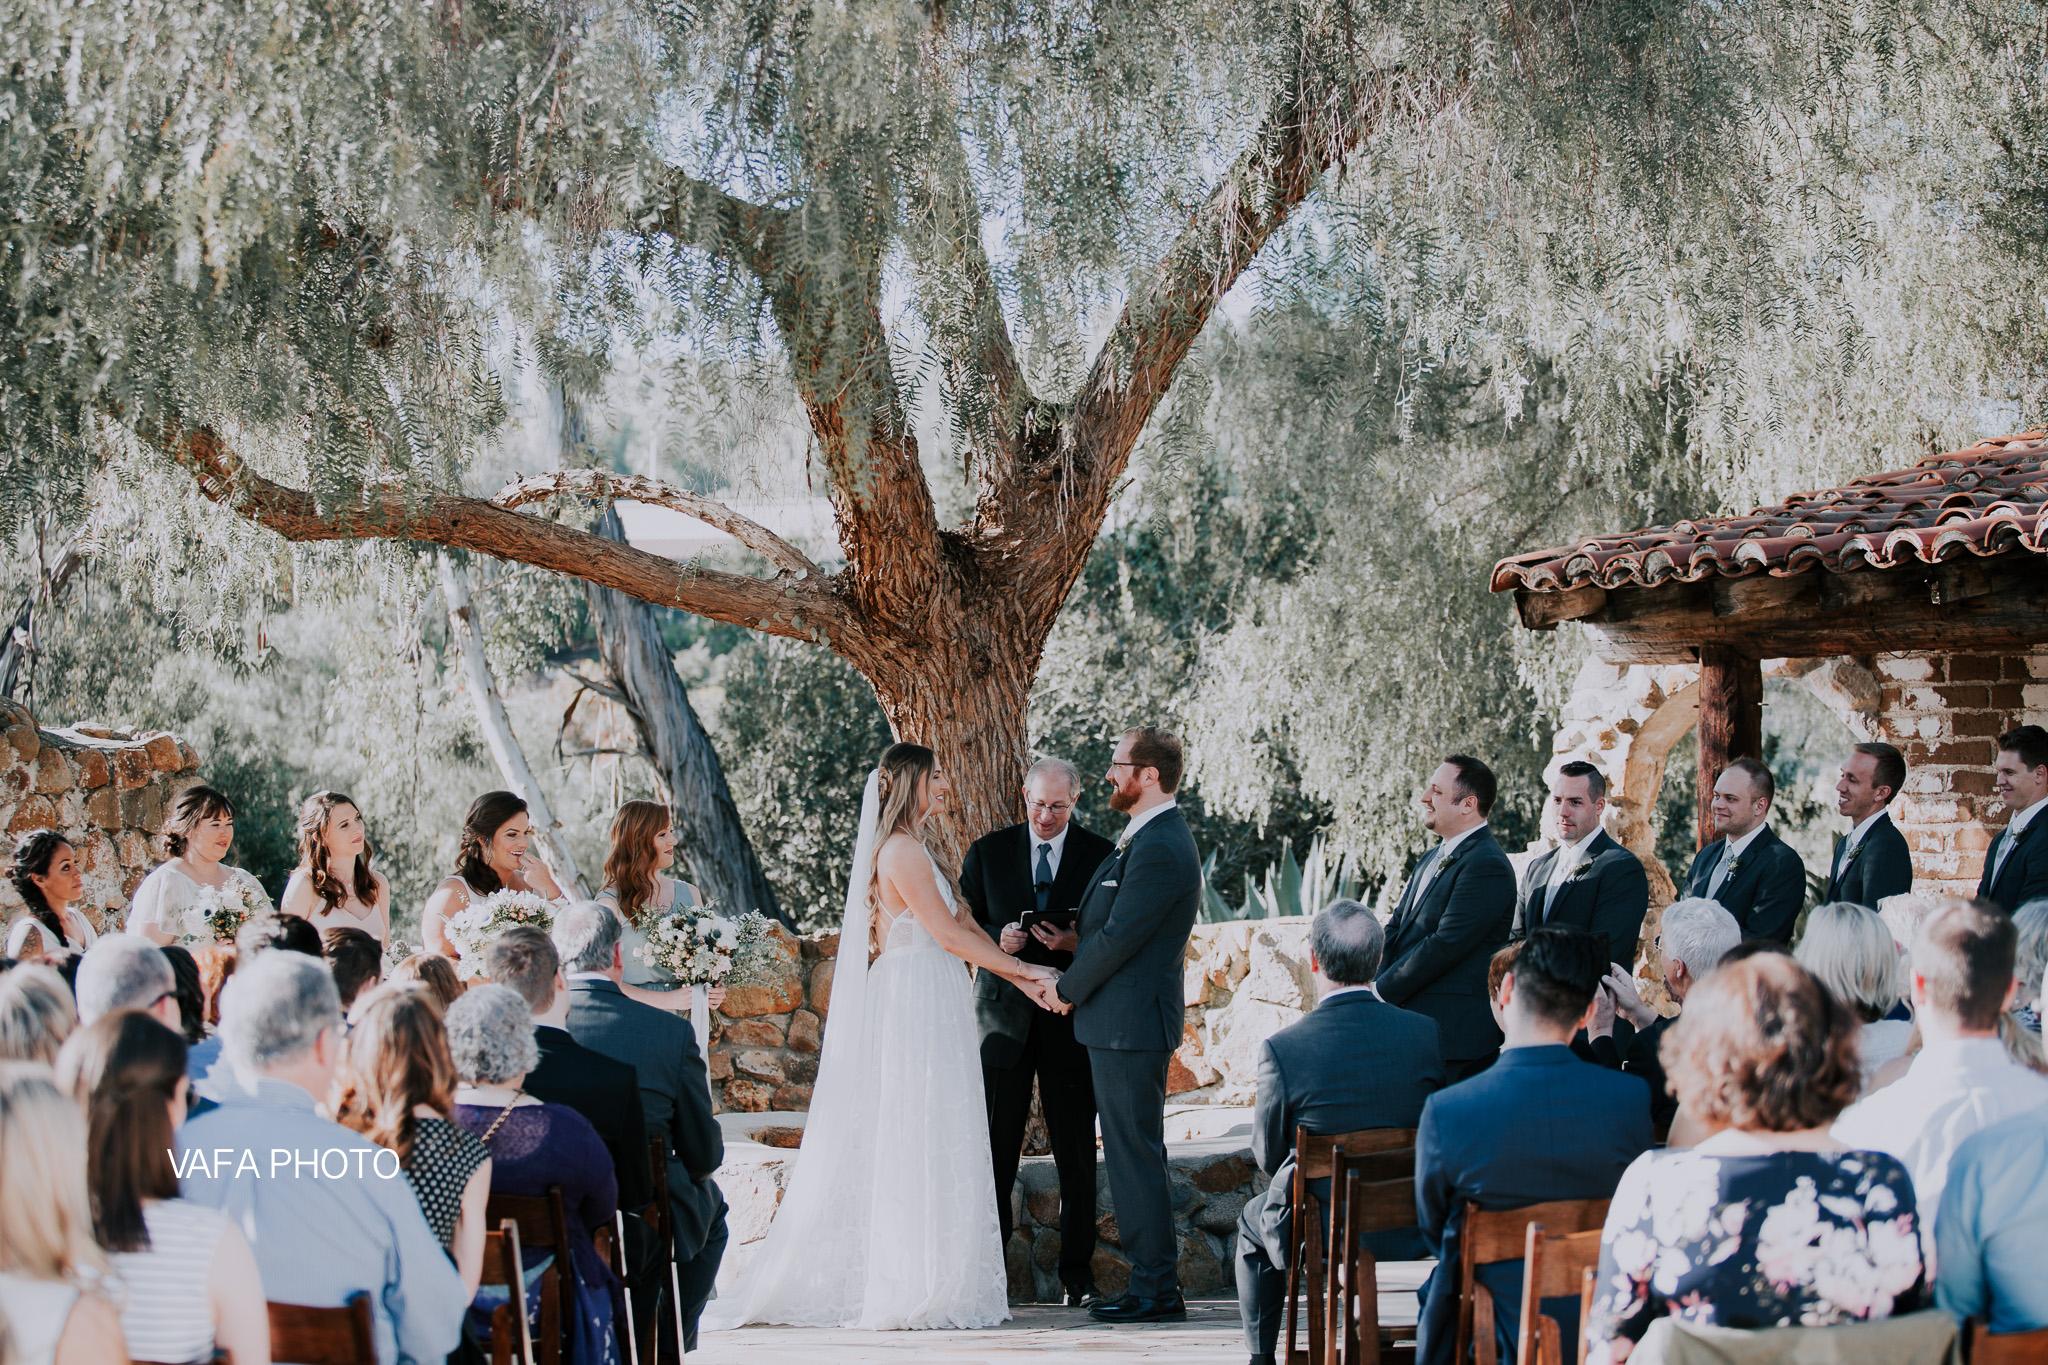 Leo-Carrillo-Ranch-Wedding-Lauren-Mike-Vafa-Photo-565.jpg